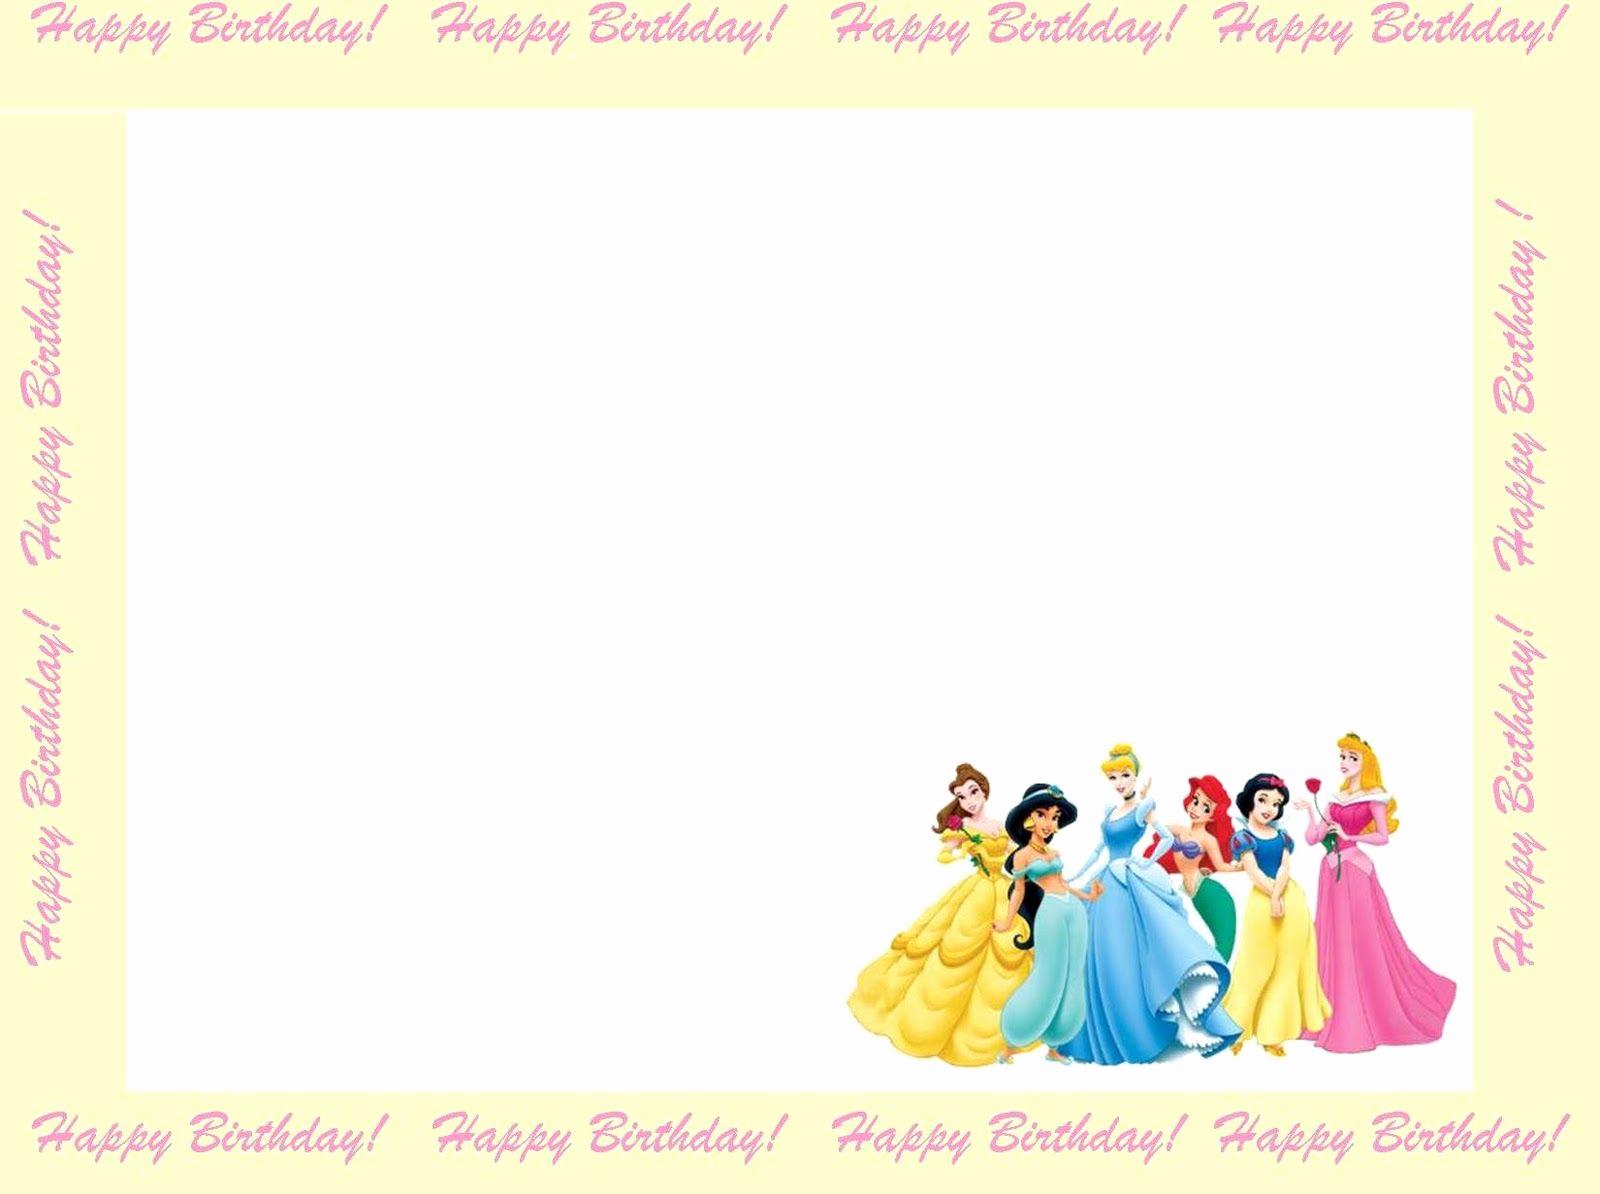 Disney Princess Invitation Templates Free Luxury 6 Free Borders for Birthday Invitations